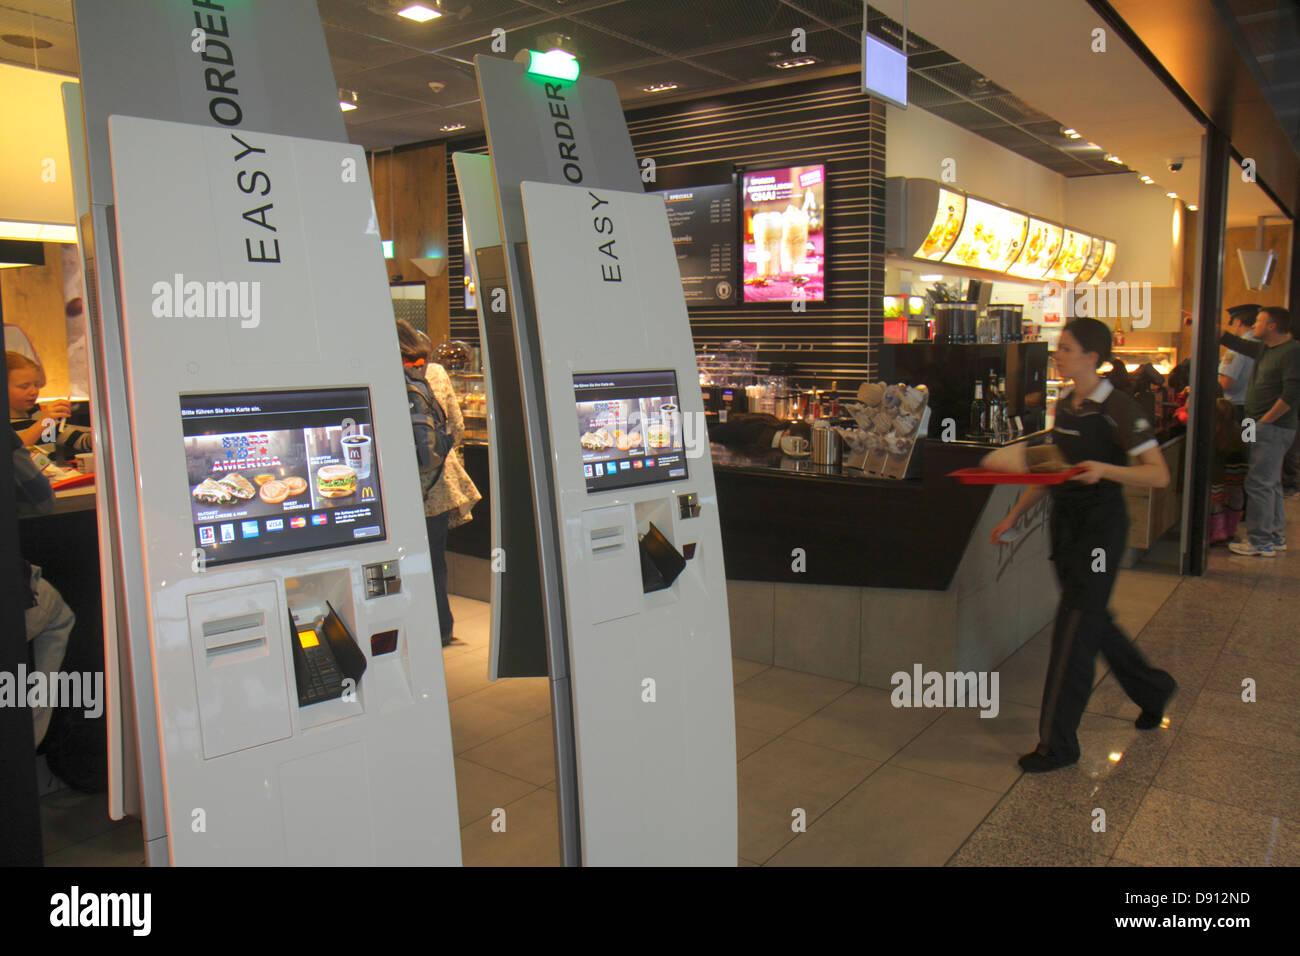 Germany Frankfurt am Main Airport FRA terminal gate area concourse McDonald's fast food restaurant self-service - Stock Image